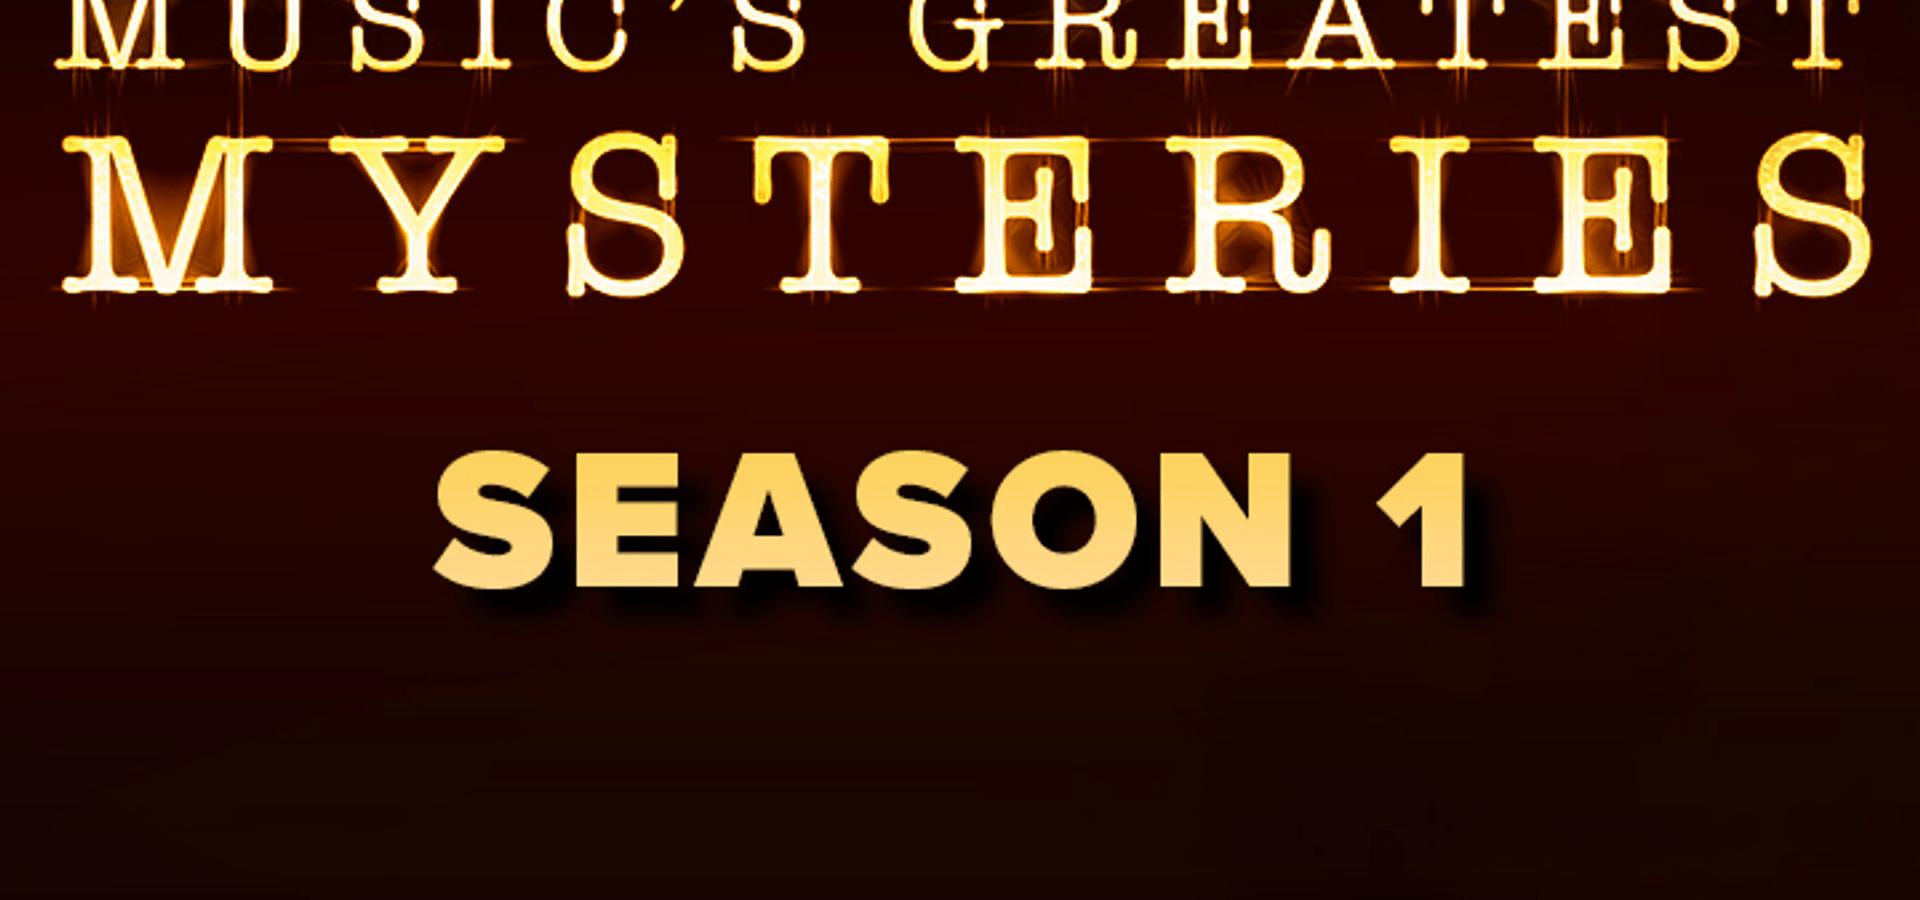 Music's Greatest Mysteries Season 1